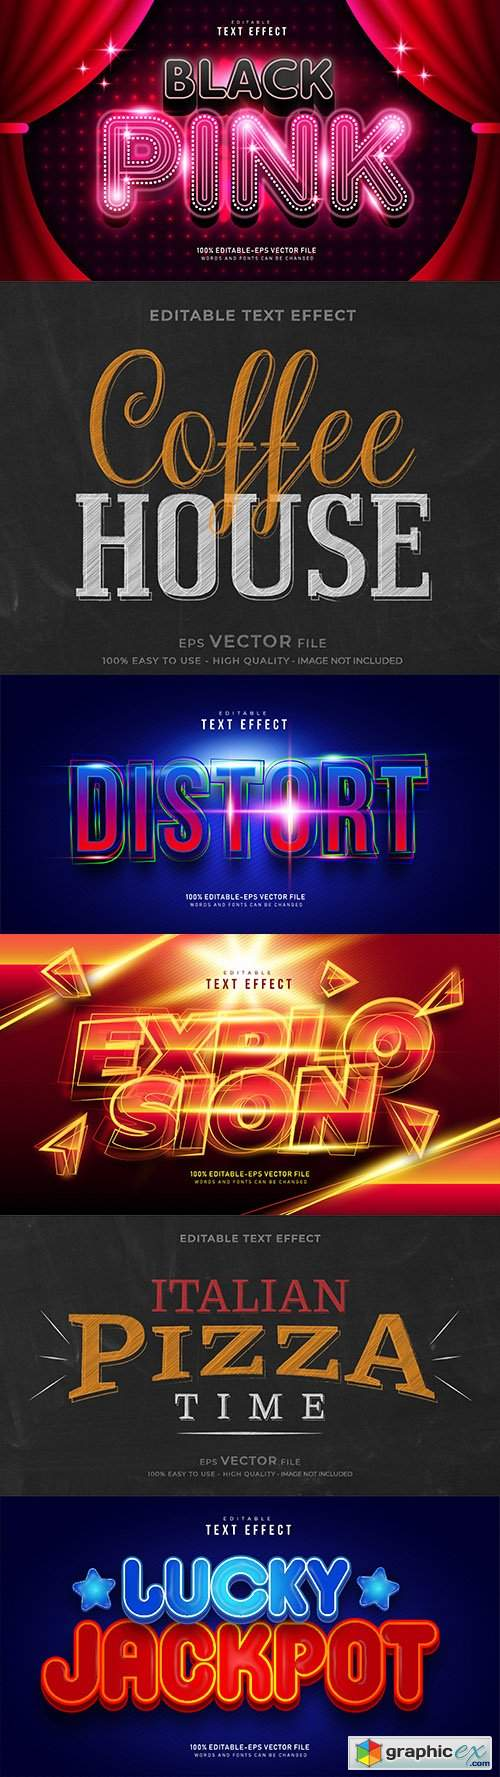 Editable font effect text collection illustration design 187